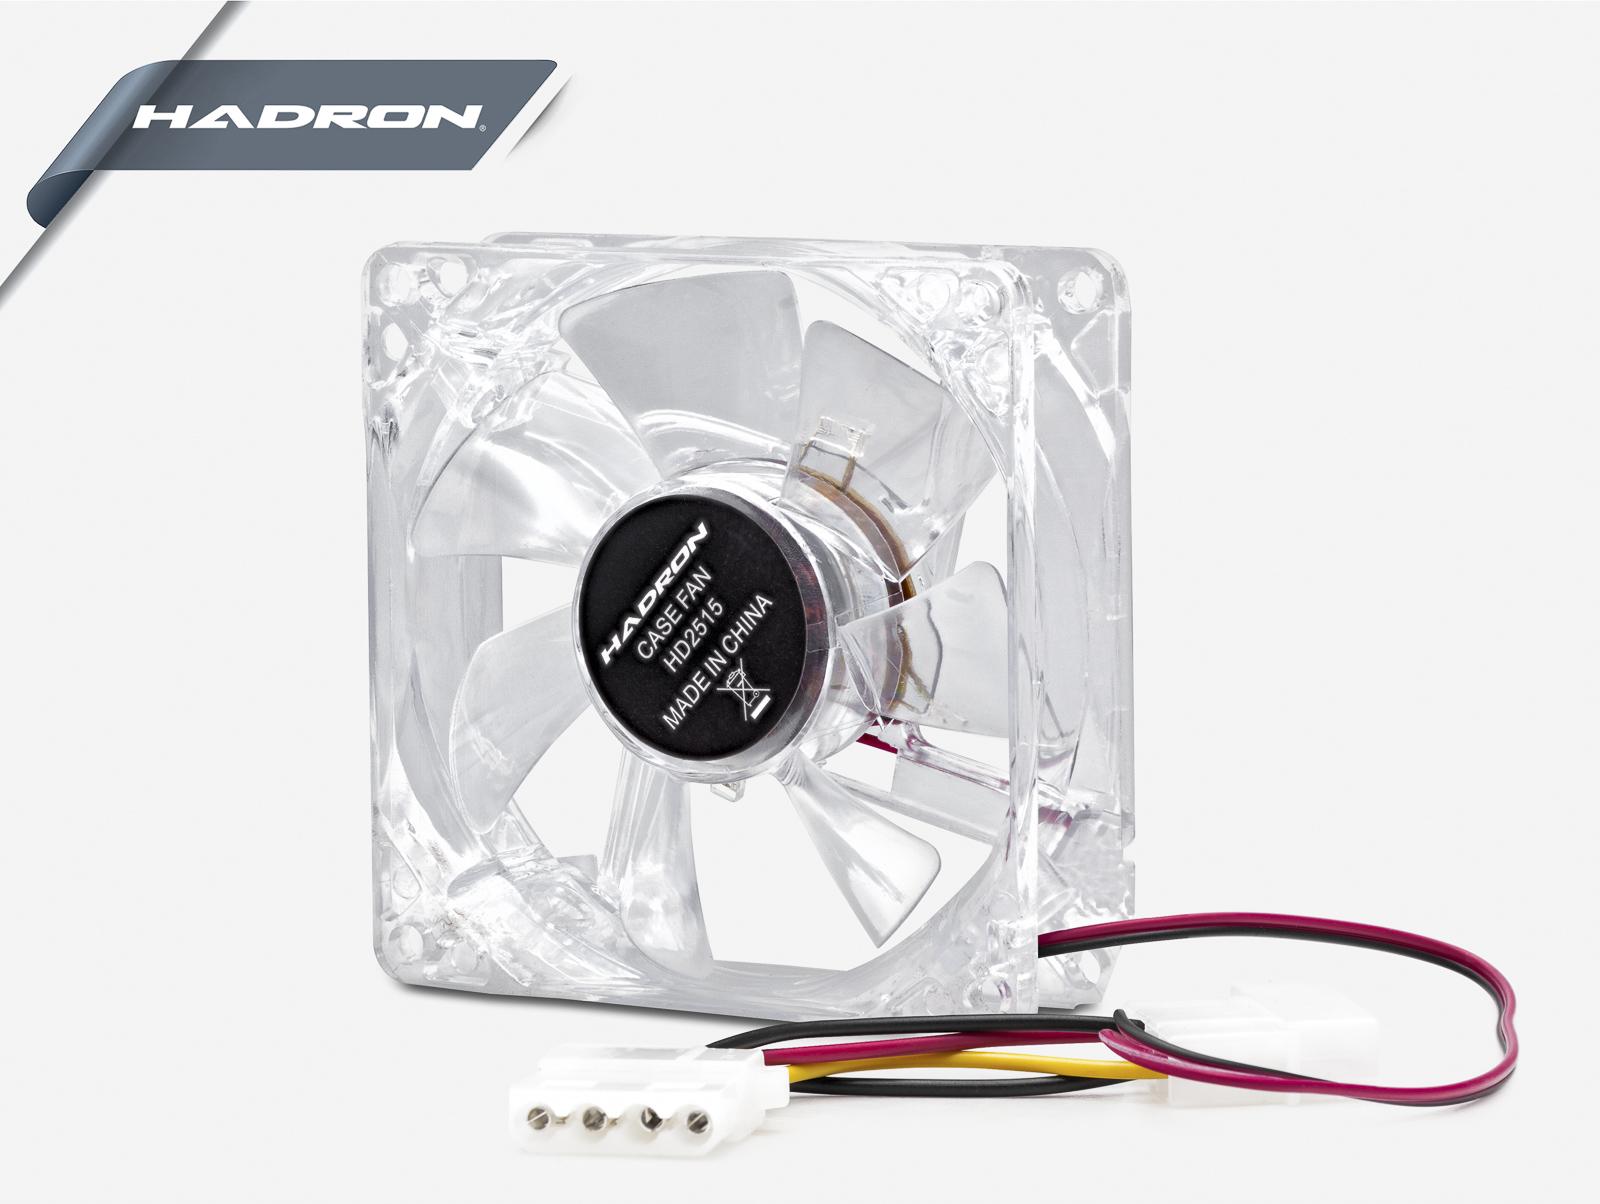 Hadron Hd2515 8 Cm Işıklı Kasa Fanı 8Cm Fan